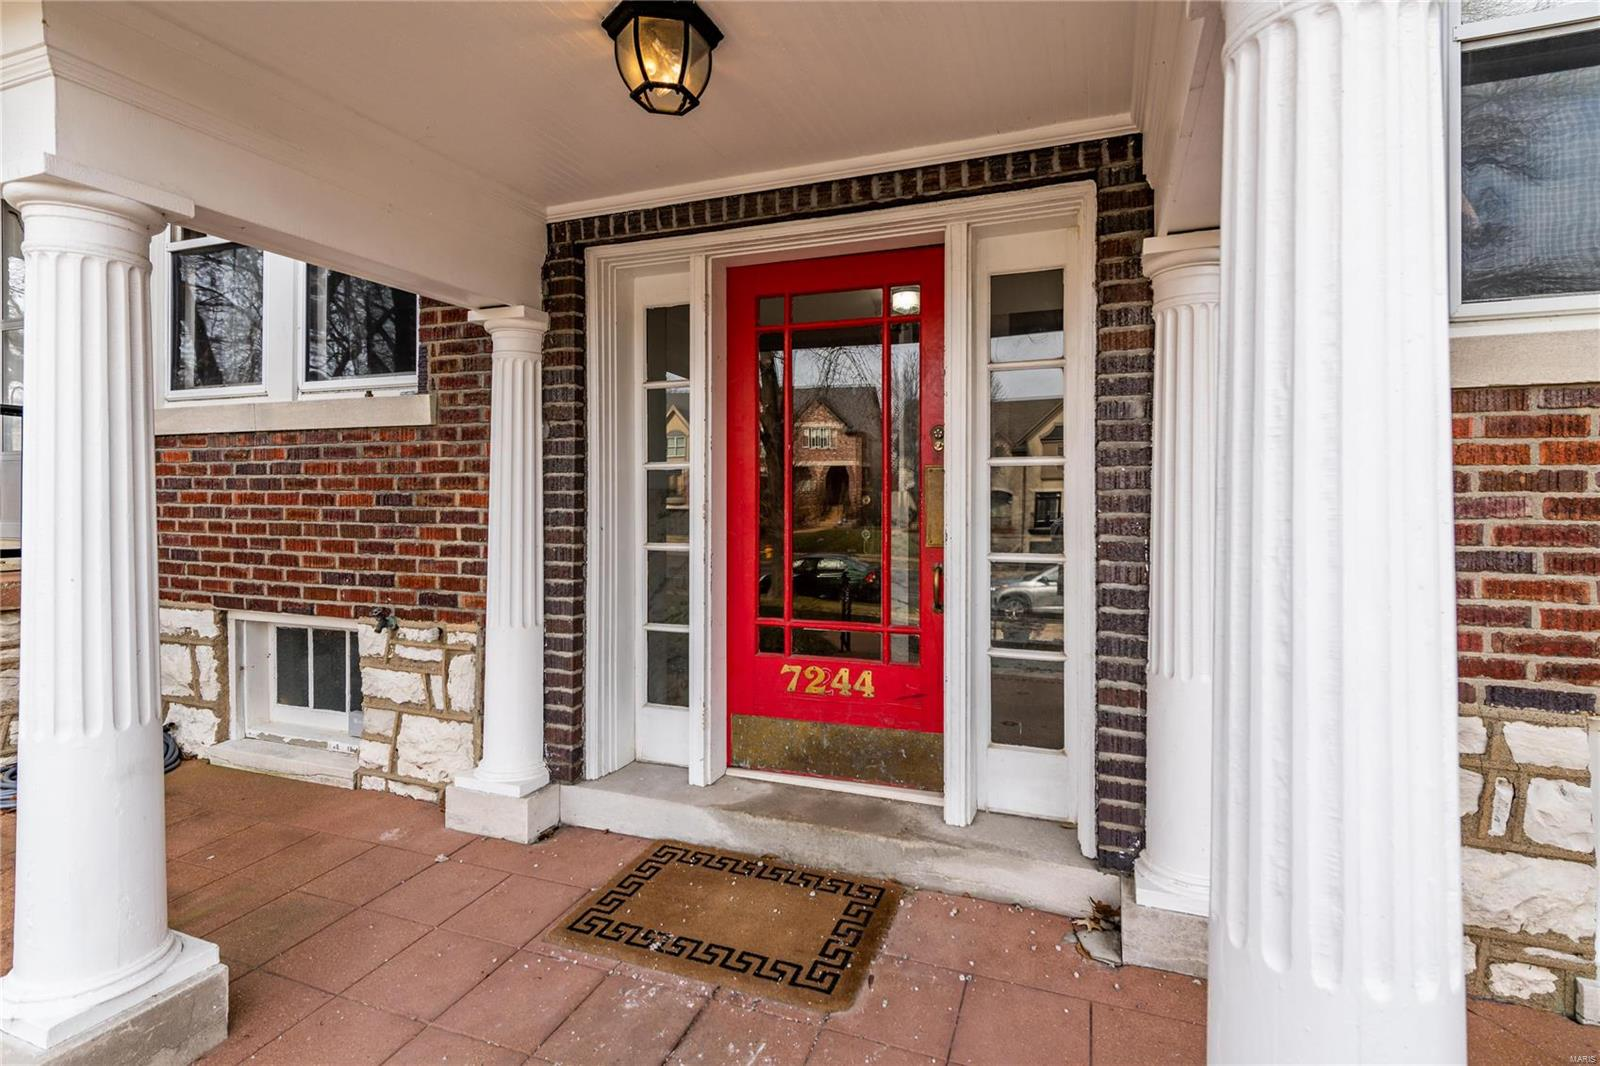 7244 Forsyth Real Estate Listings Main Image